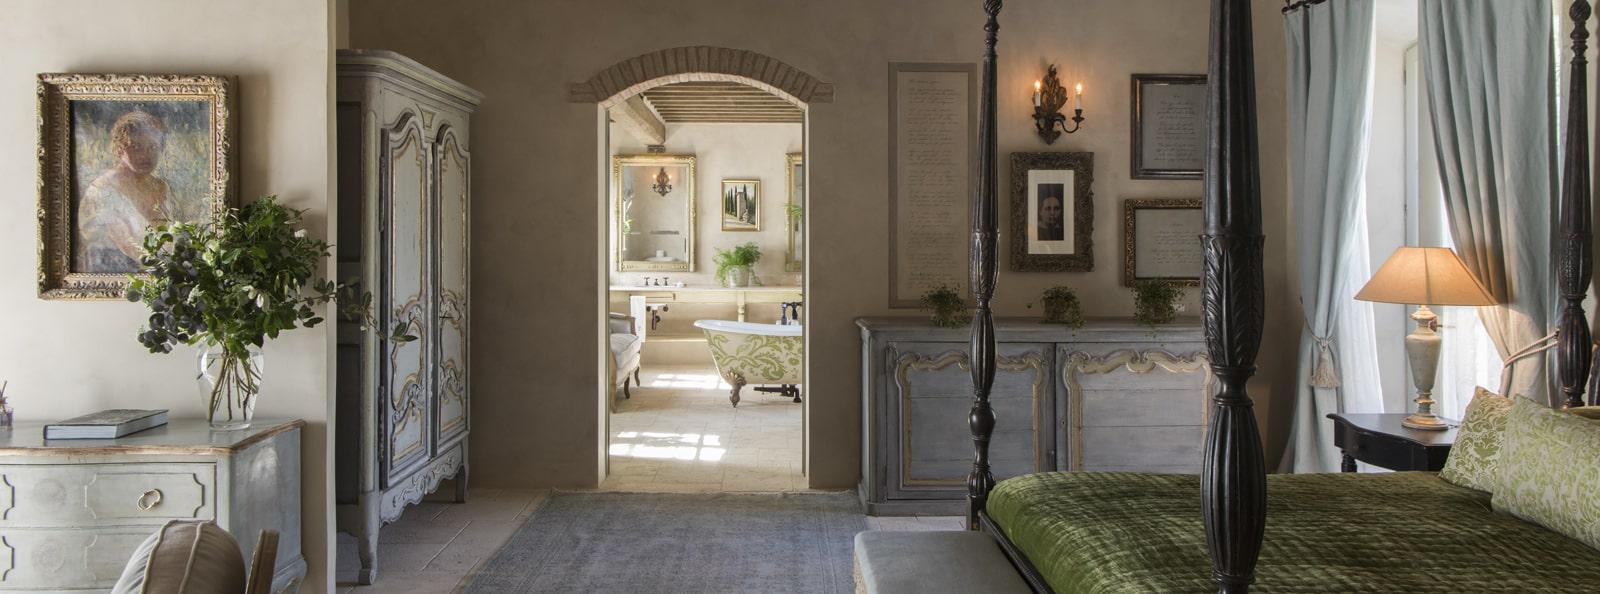 Dina Ferri Garden Suite